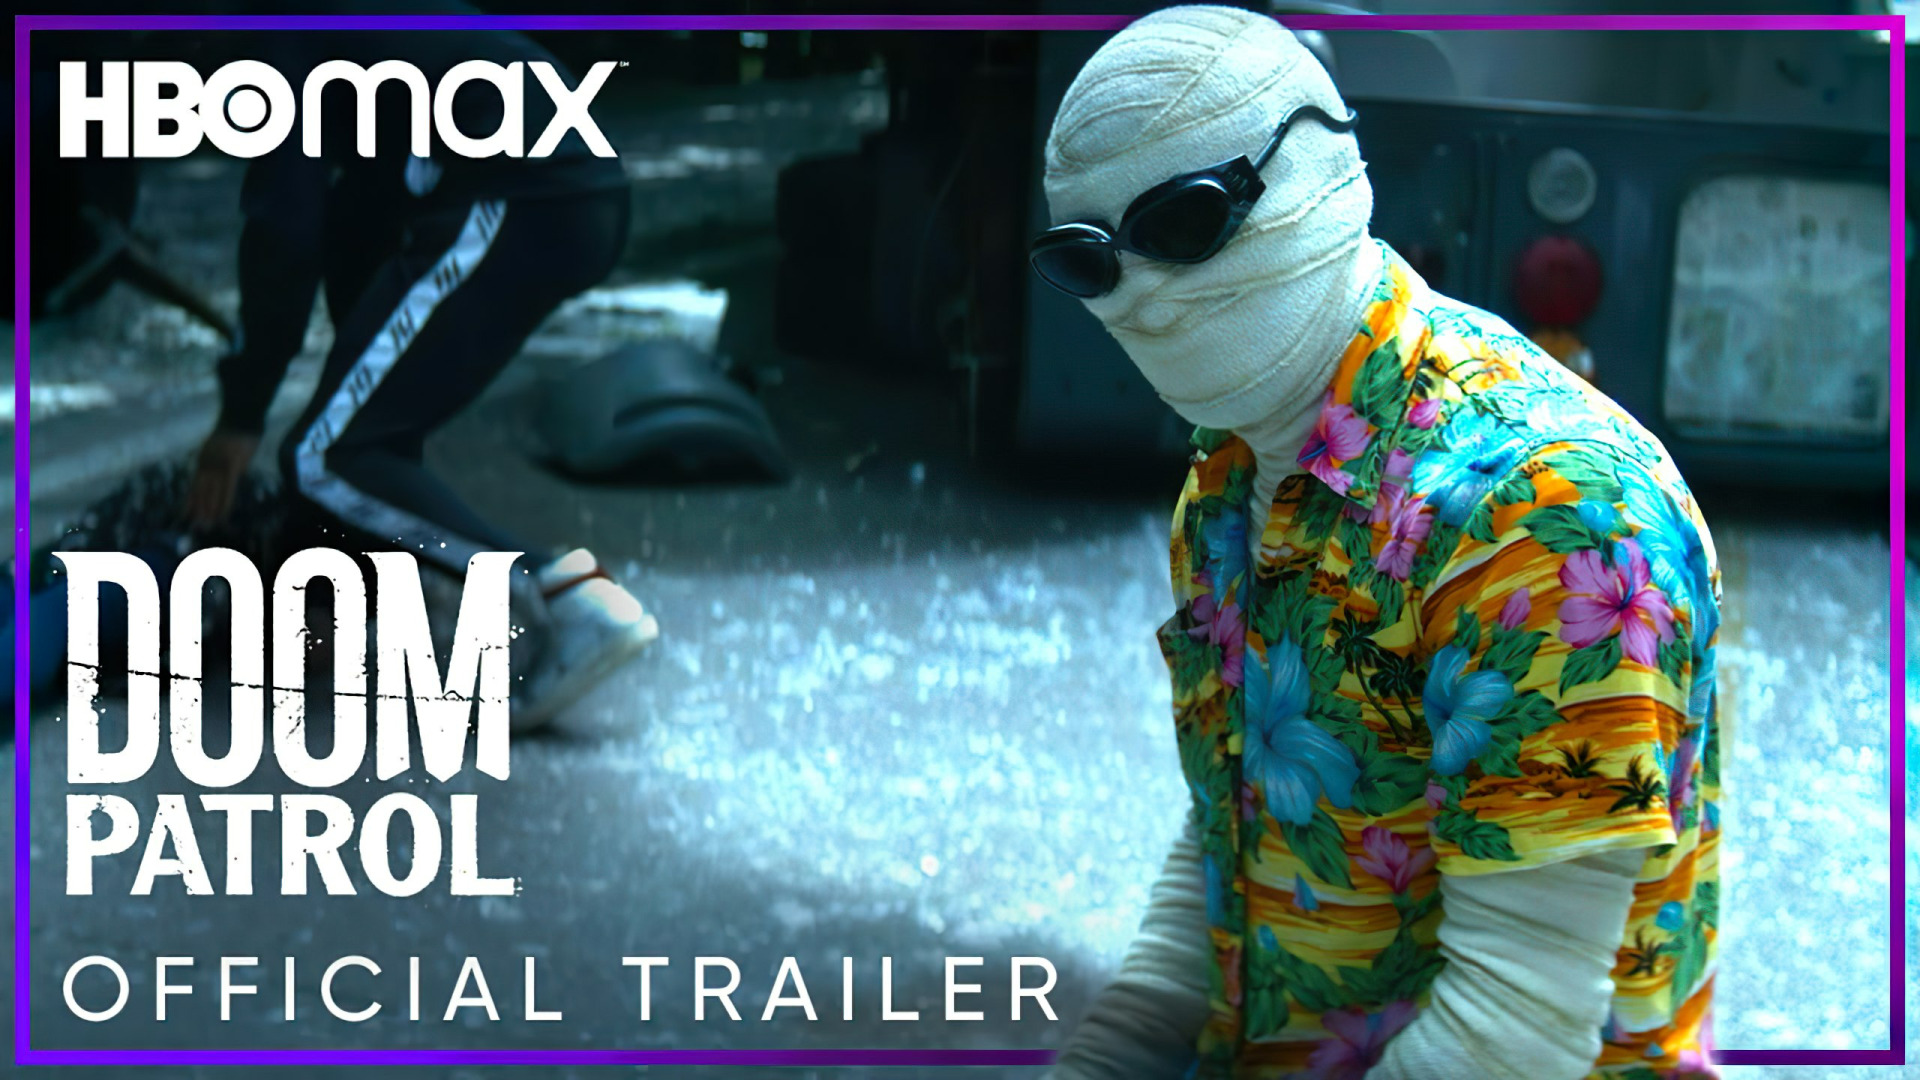 Trailer, Serie, DC, DC Comics, HBO Max, DC Universe, Doom Patrol